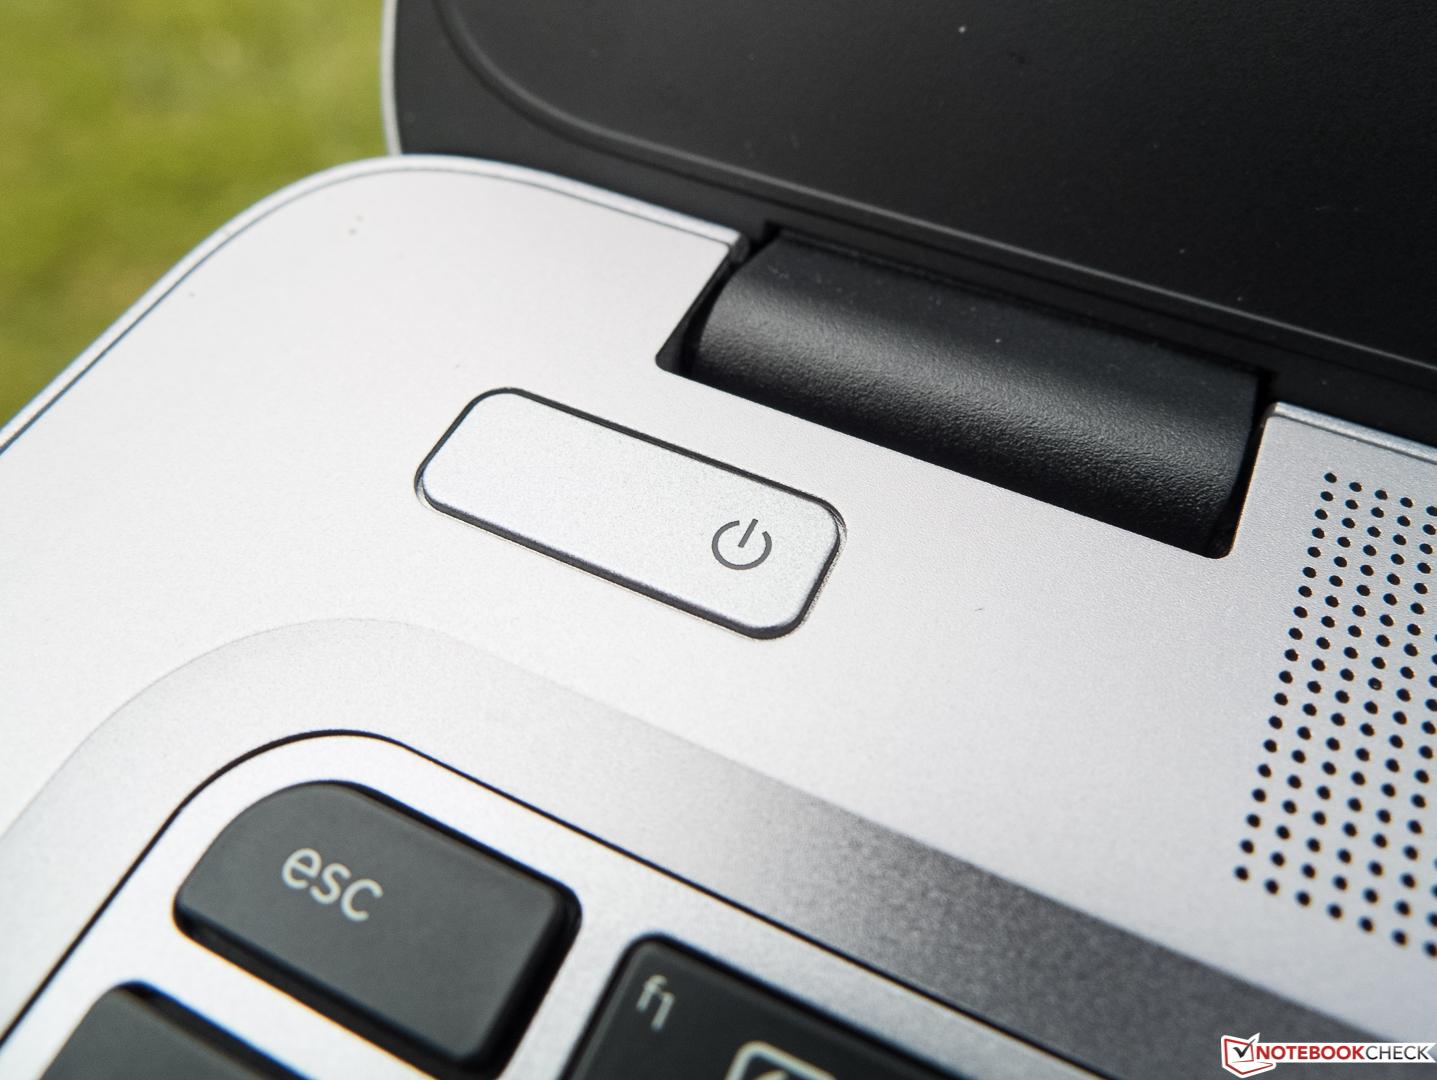 Hp Elitebook 840 G3 Notebook Review Reviews Lenovo Thinkpad X260 Vpro Intel Core I5 6300u8gb Ddr4512gb Ssdwindows 10 Pro